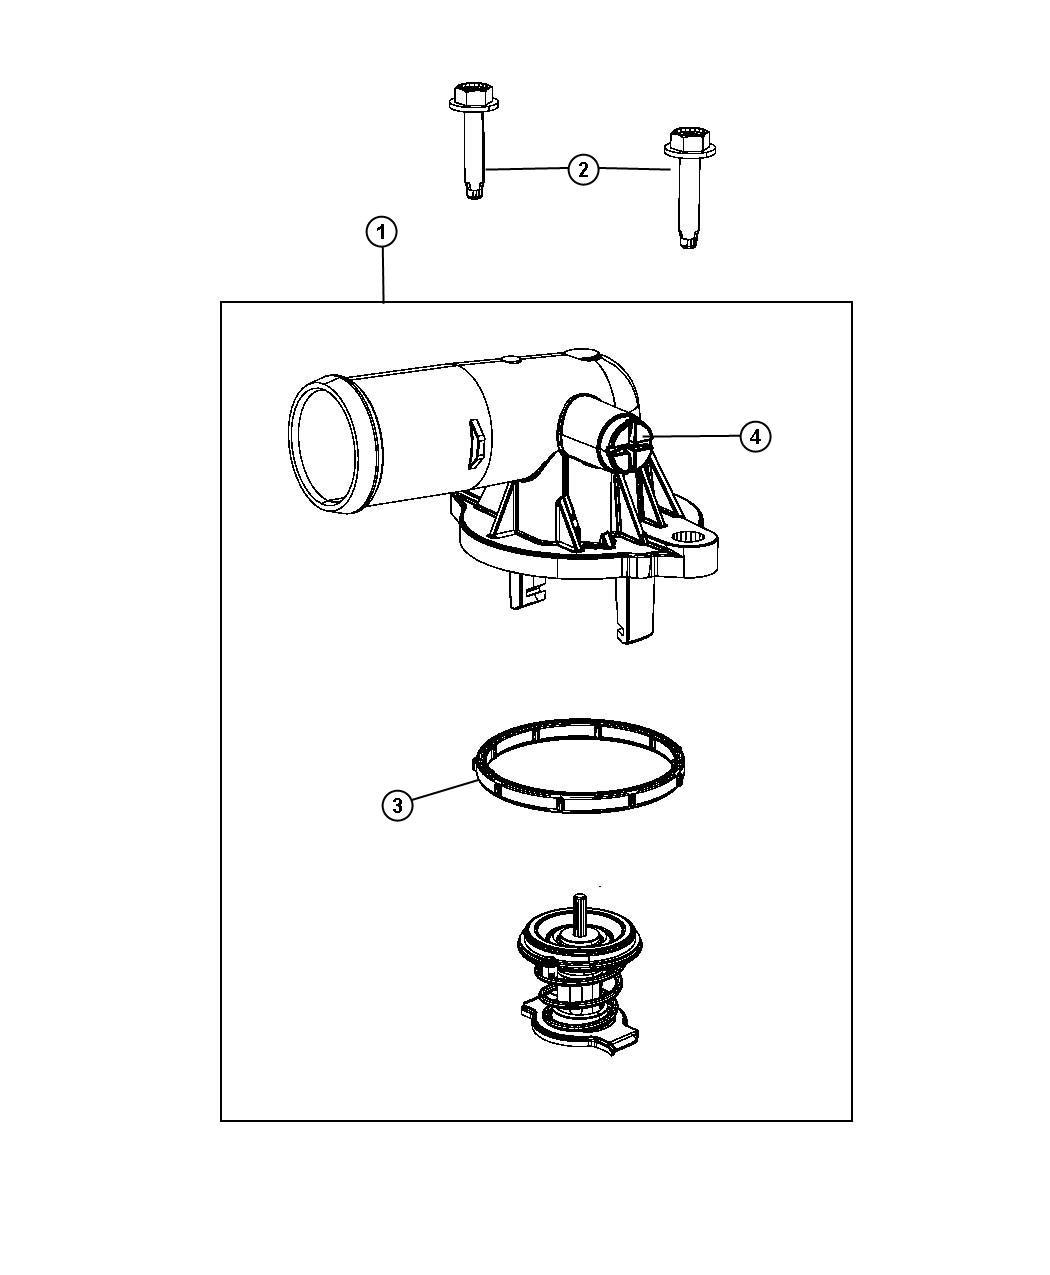 [DIAGRAM] Atwood Thermostat Set Screw Diagram FULL Version